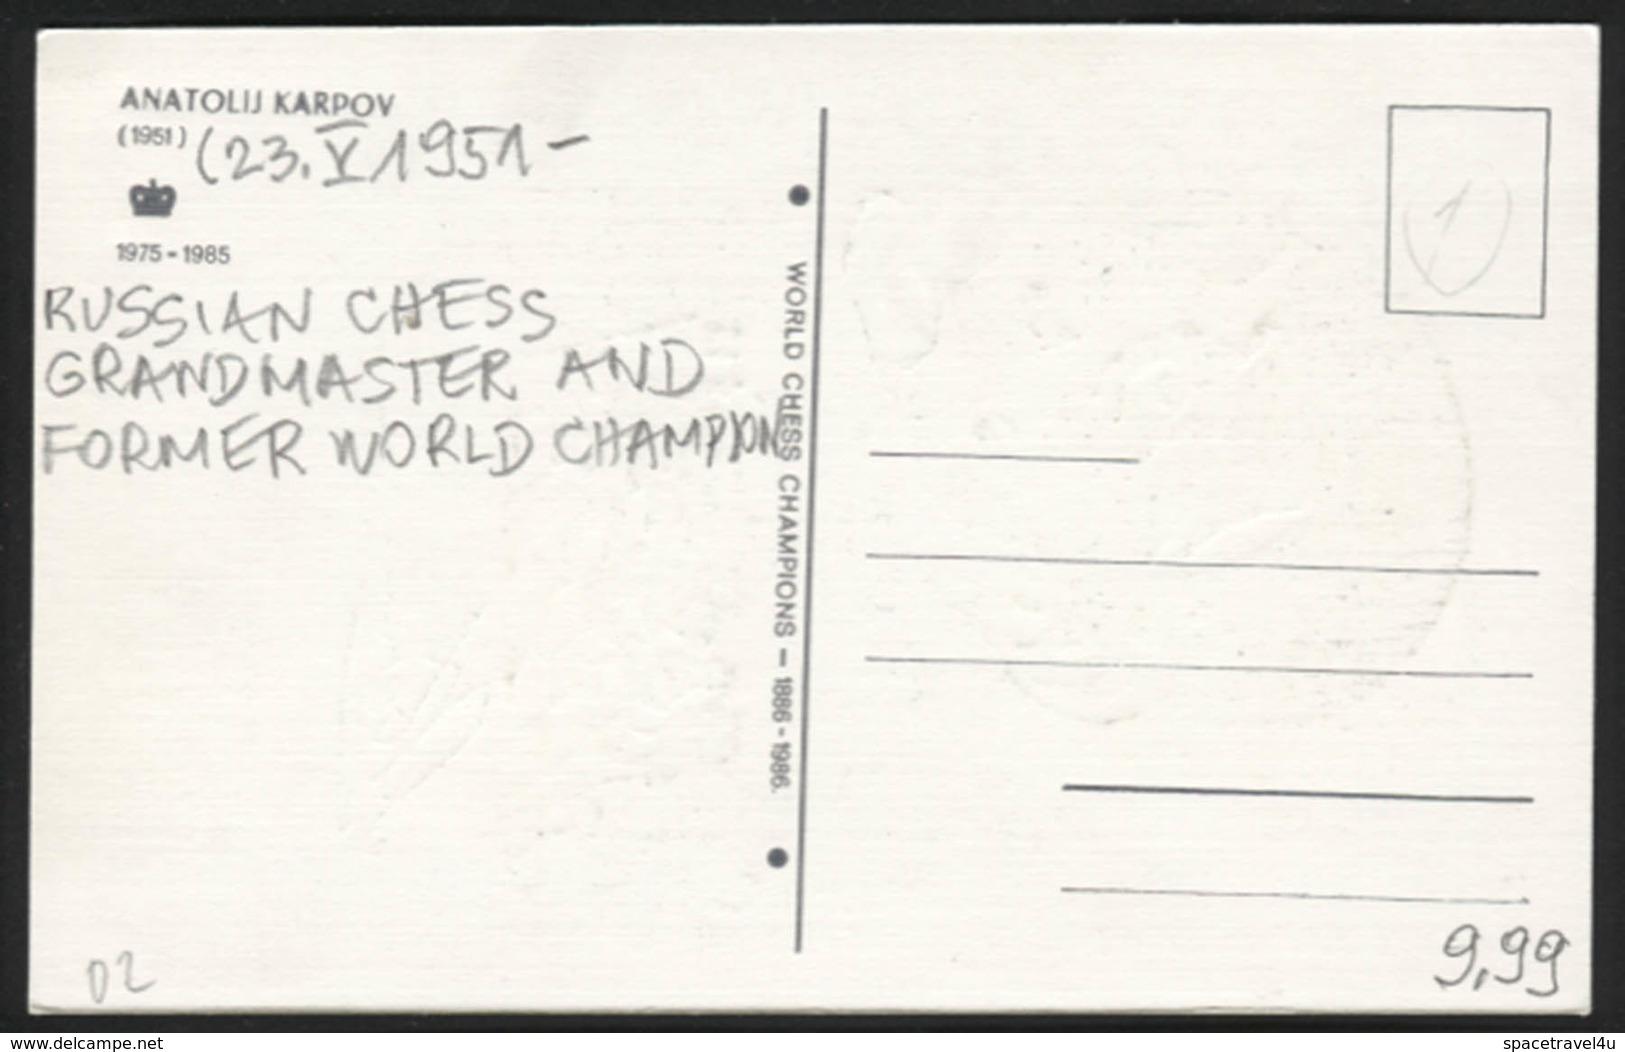 Anatolij Karpov - Russian Chess Grandmaster And Former World Champion -  Postcard - (CHESS-02) - Cartes Postales